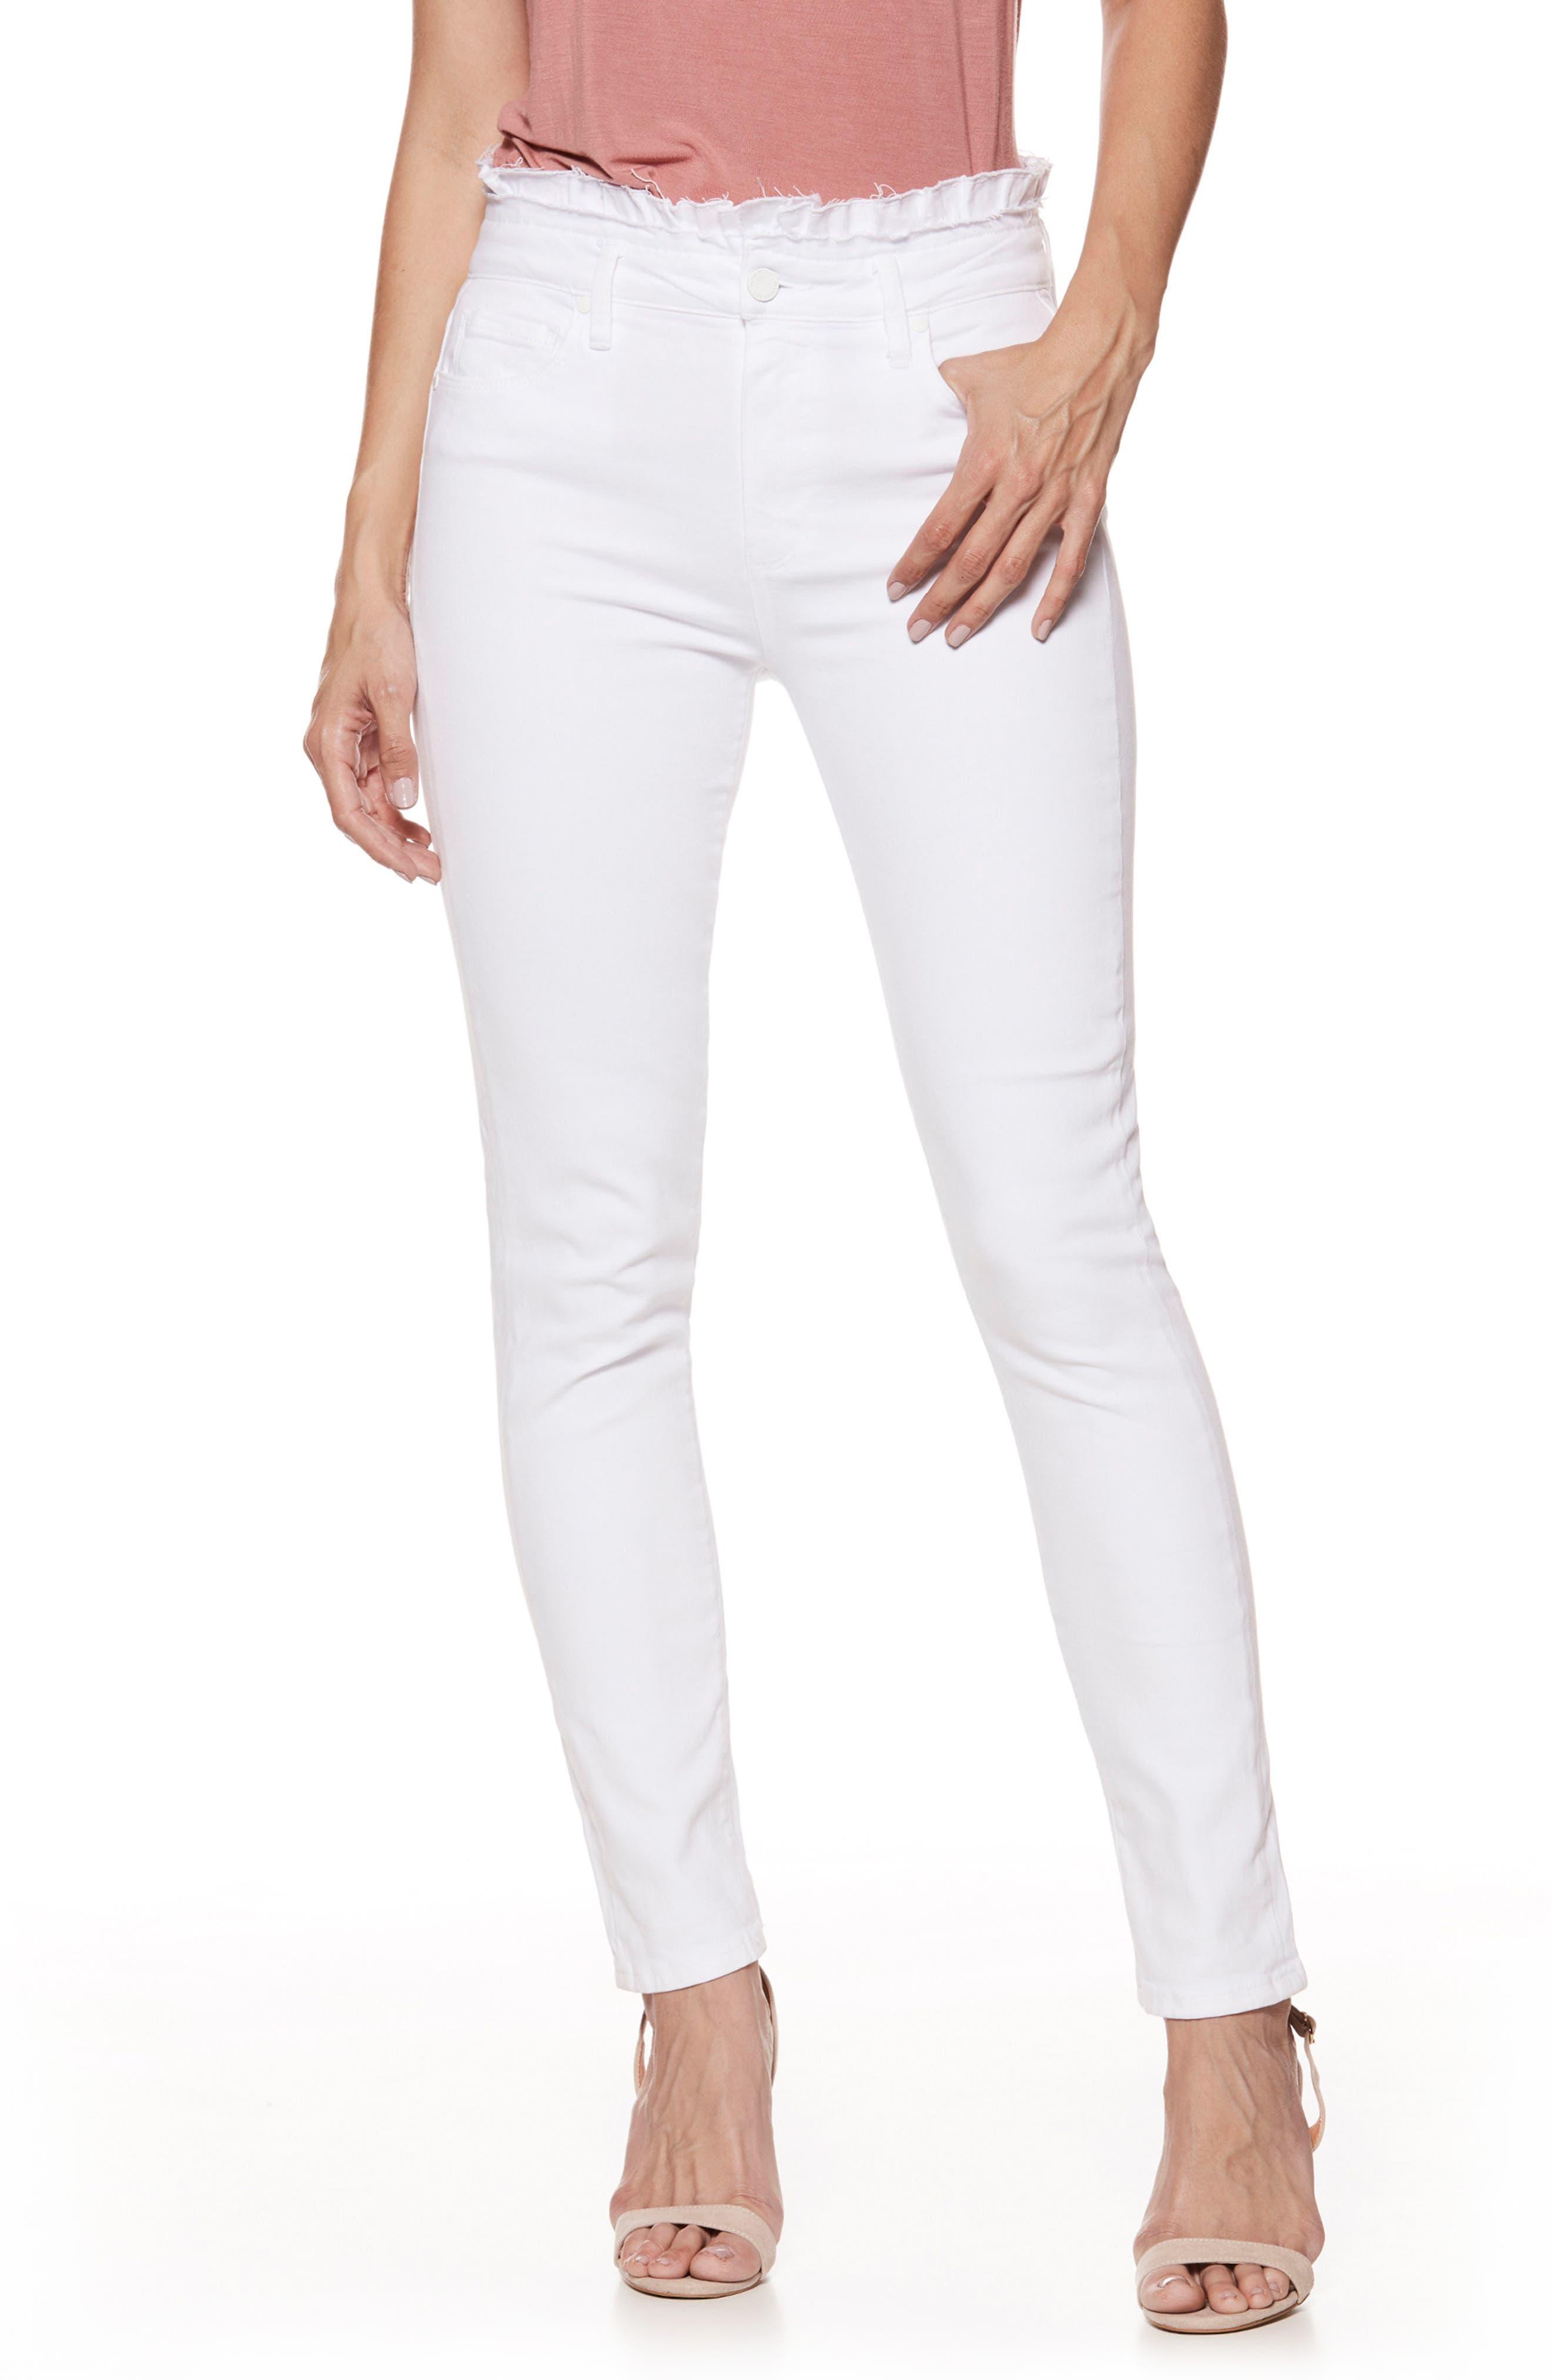 Hoxton Ruffle High Waist Ankle Ultra Skinny Jeans,                             Main thumbnail 1, color,                             CRISP WHITE